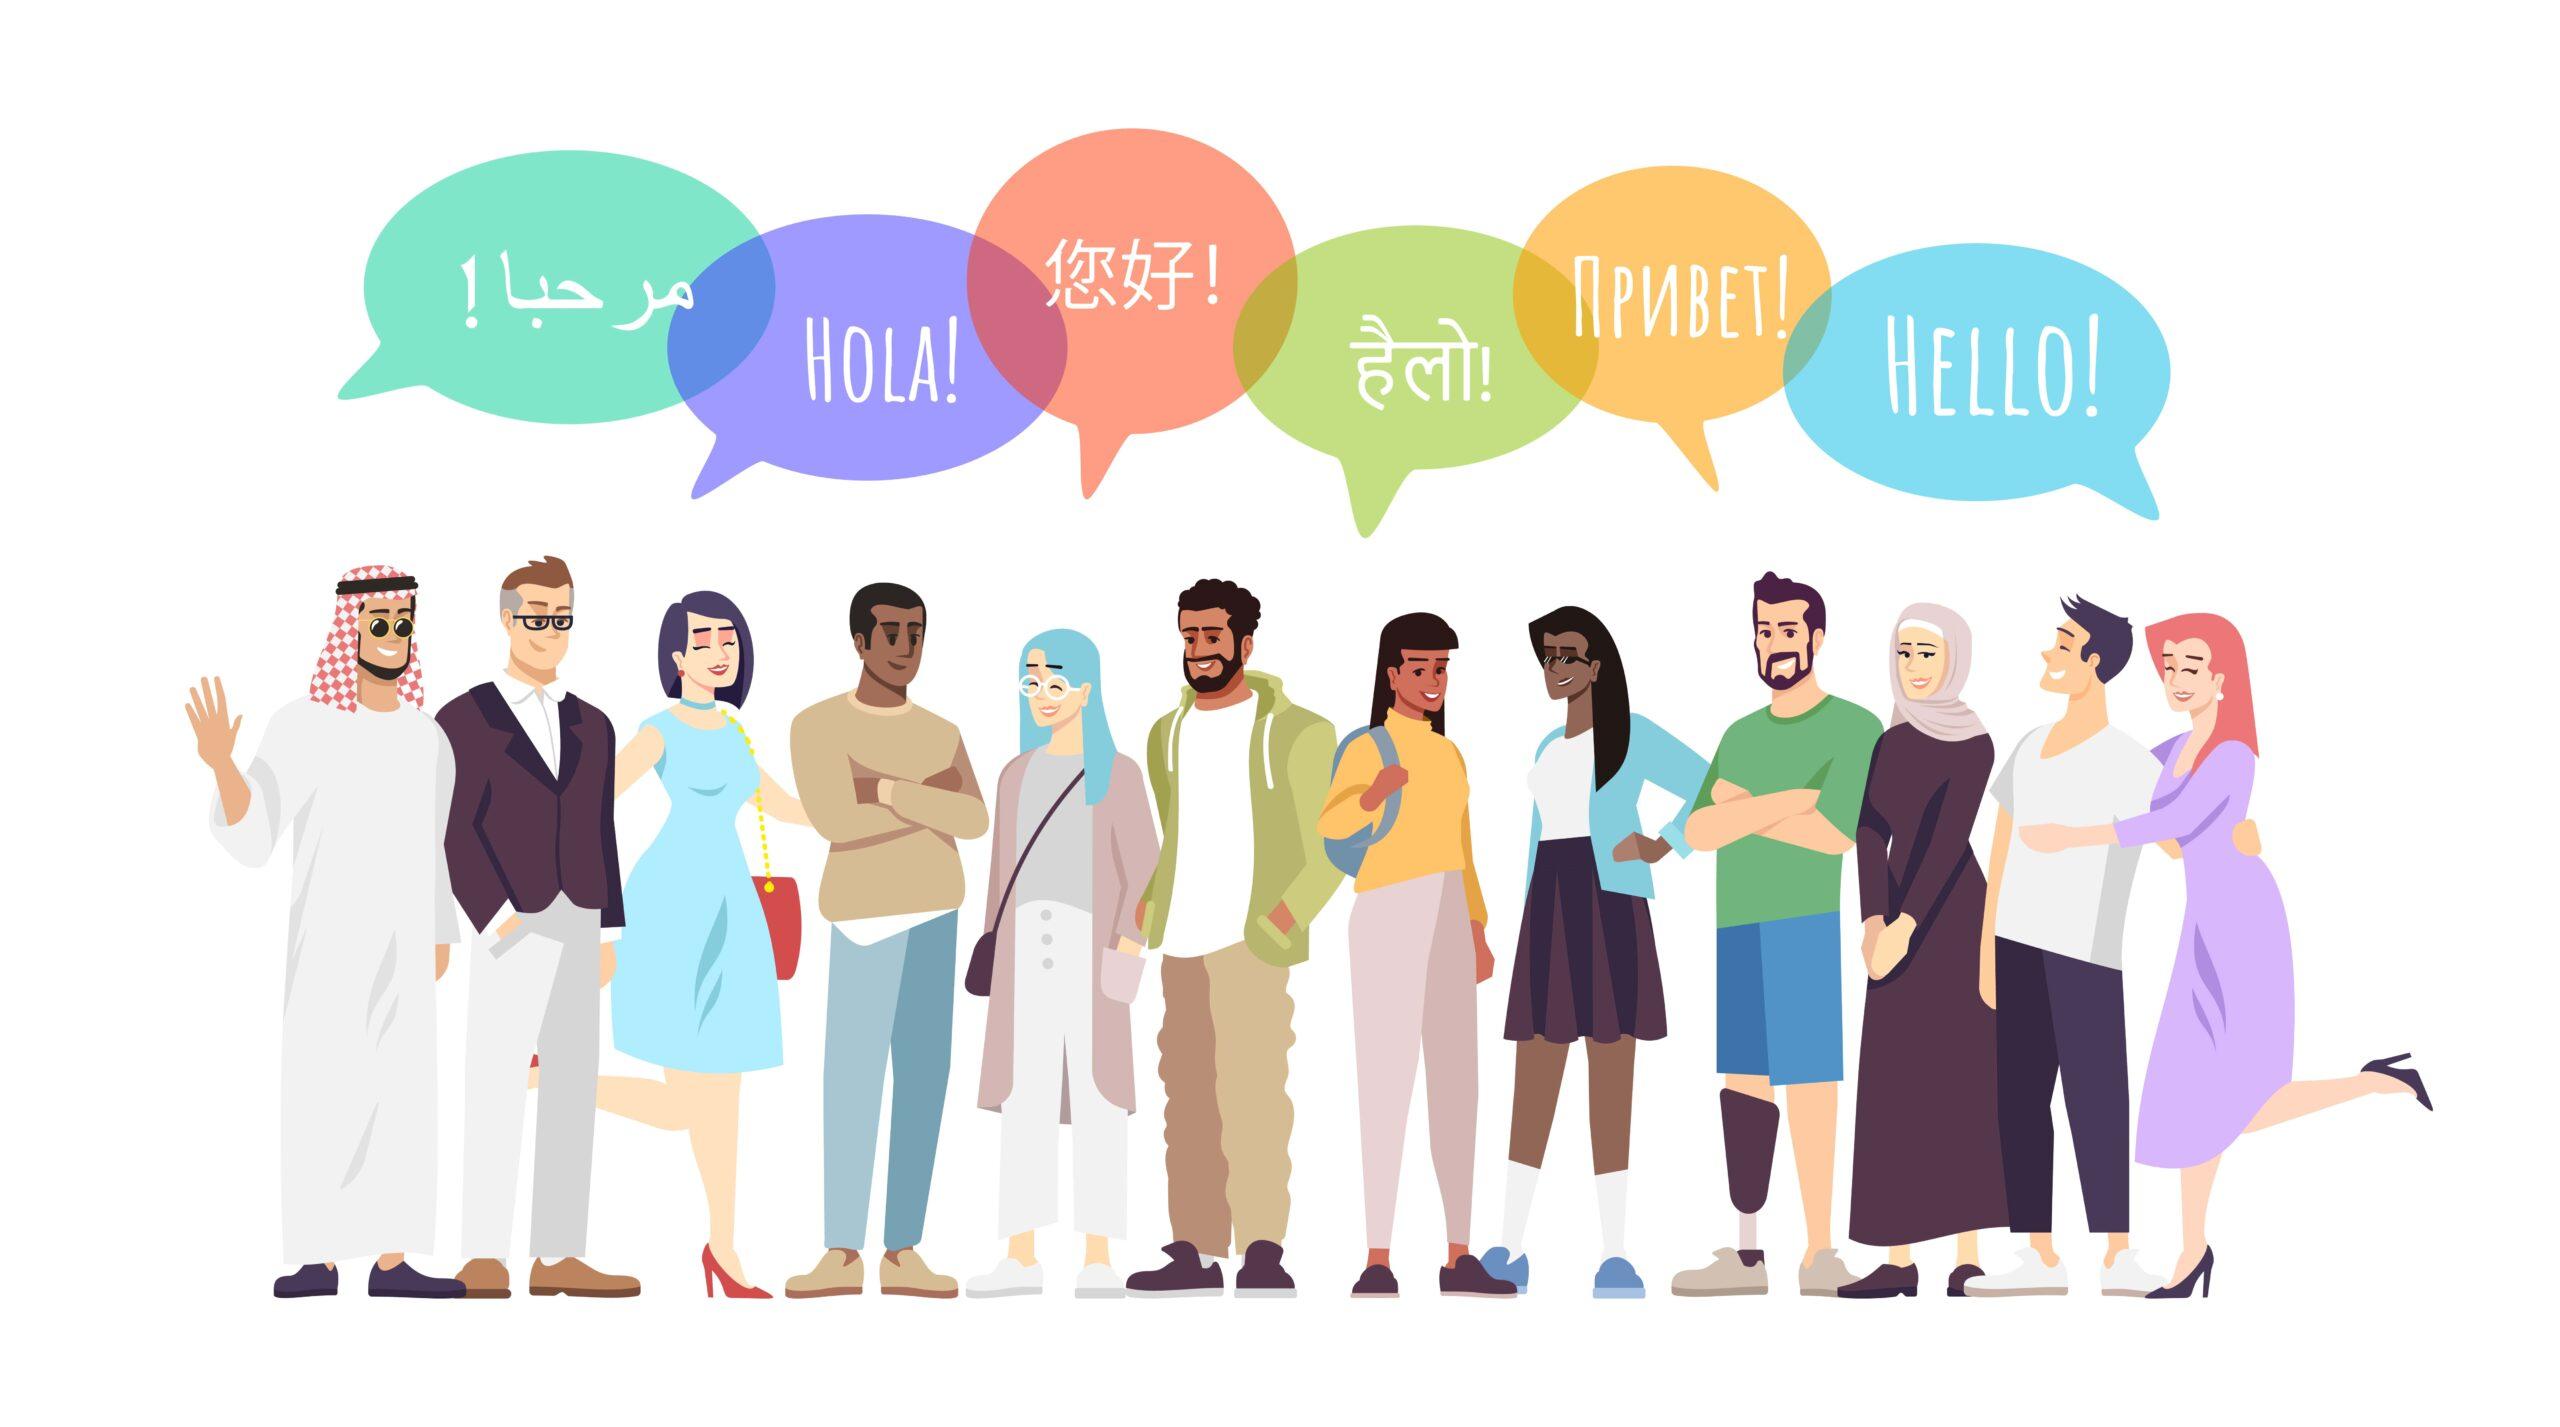 Menschen verschiedener Kulturen kommunizieren